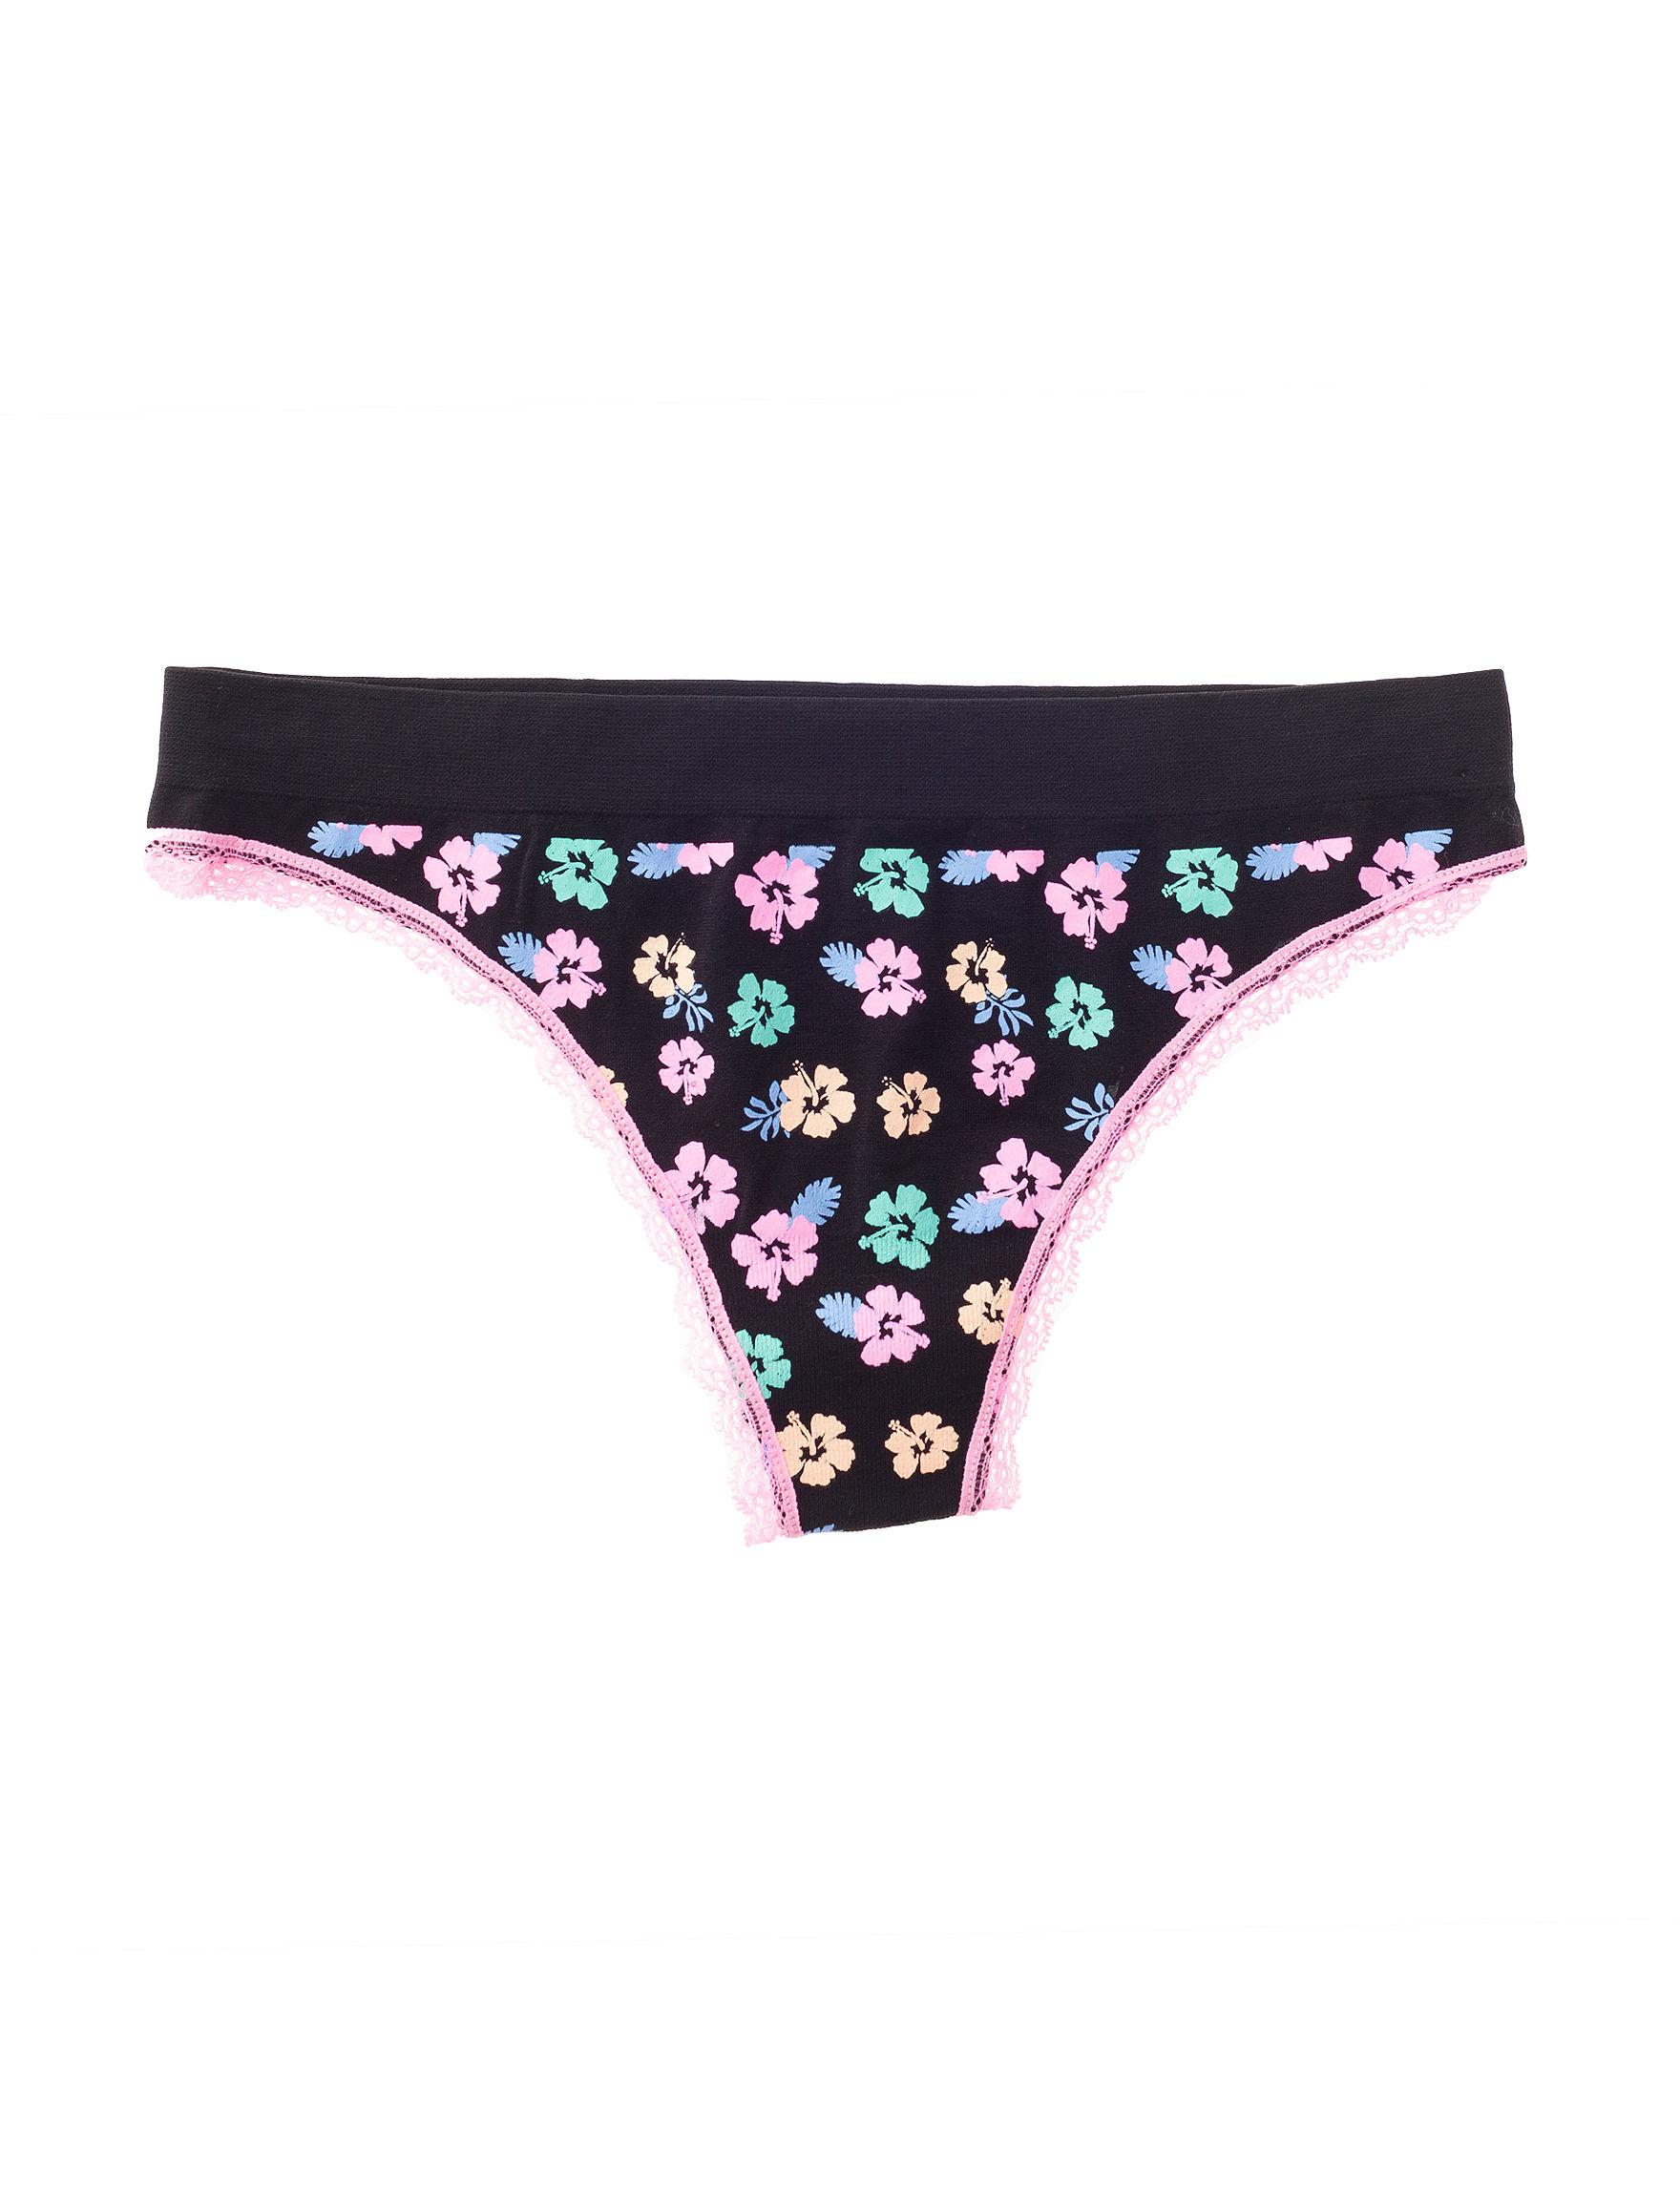 B Intimates Floral Panties Hipster Seamless Thong